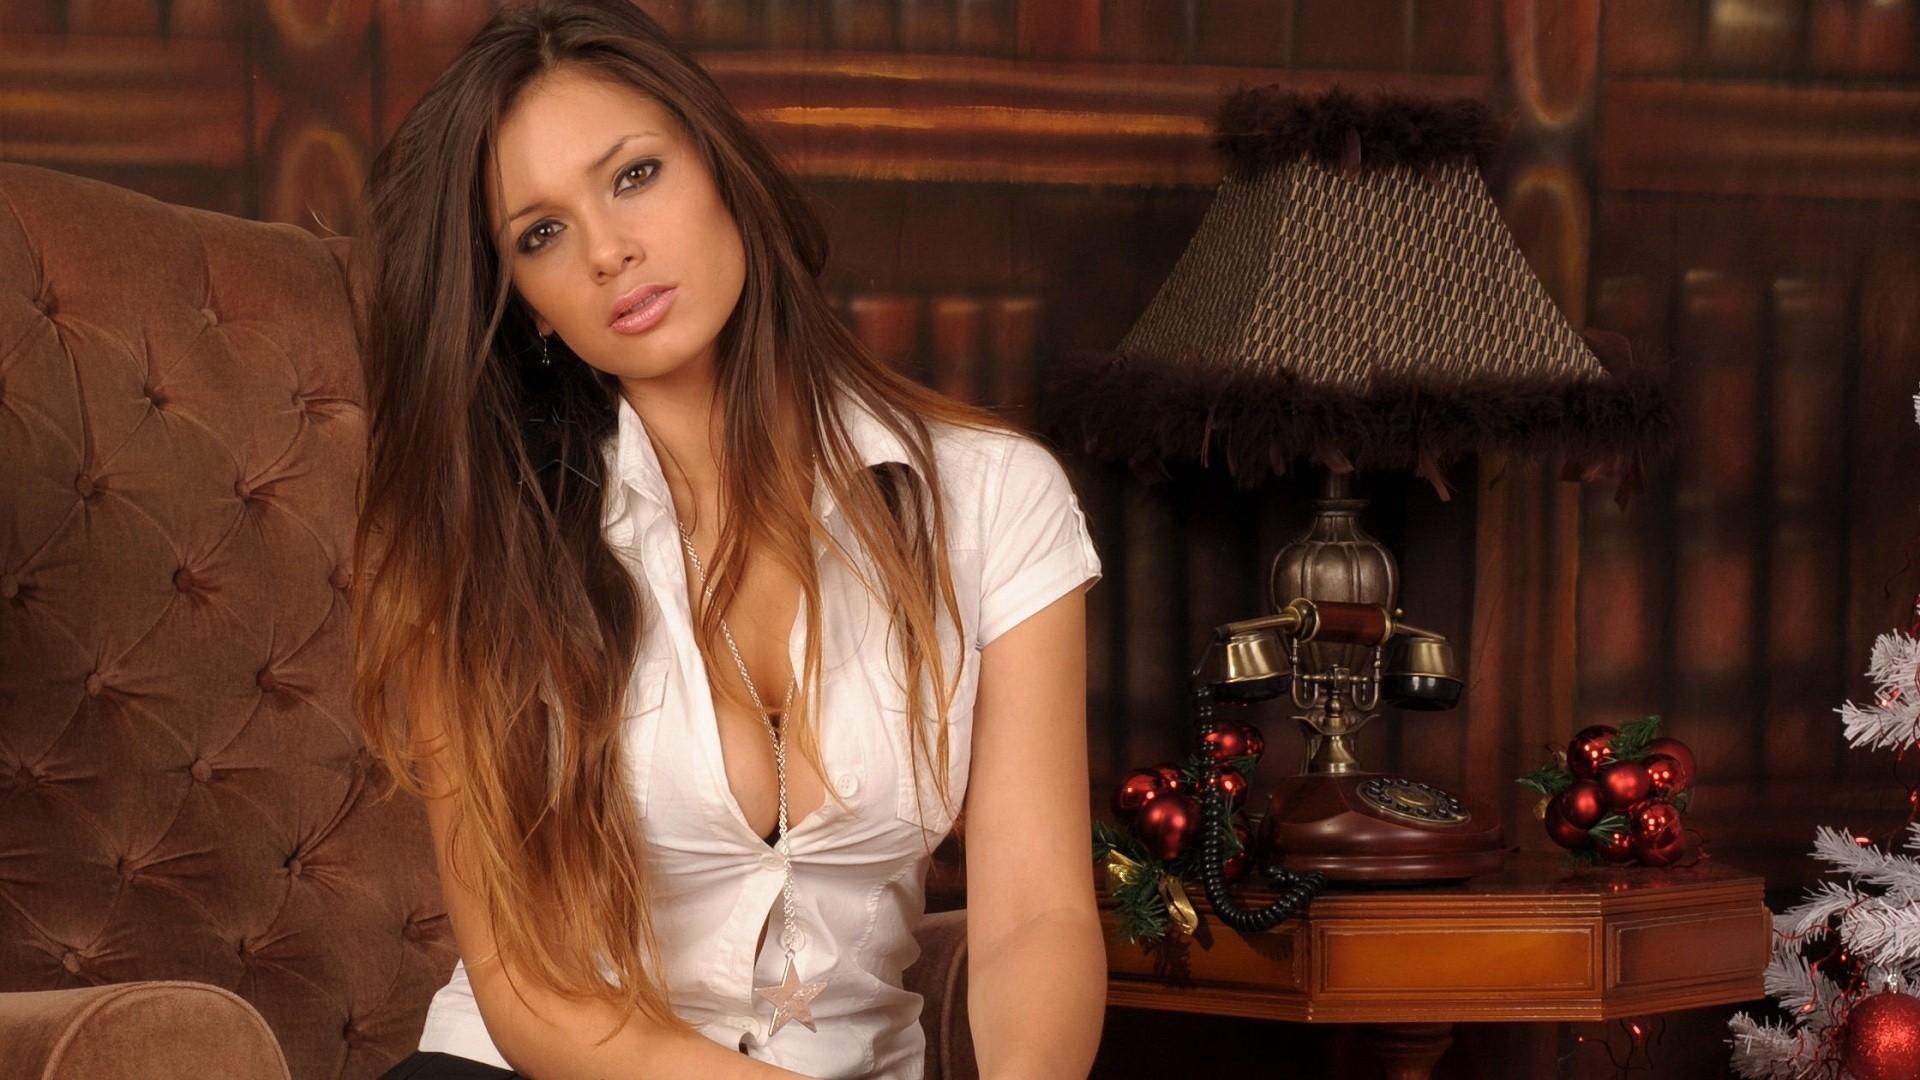 Louisa Marie 4k